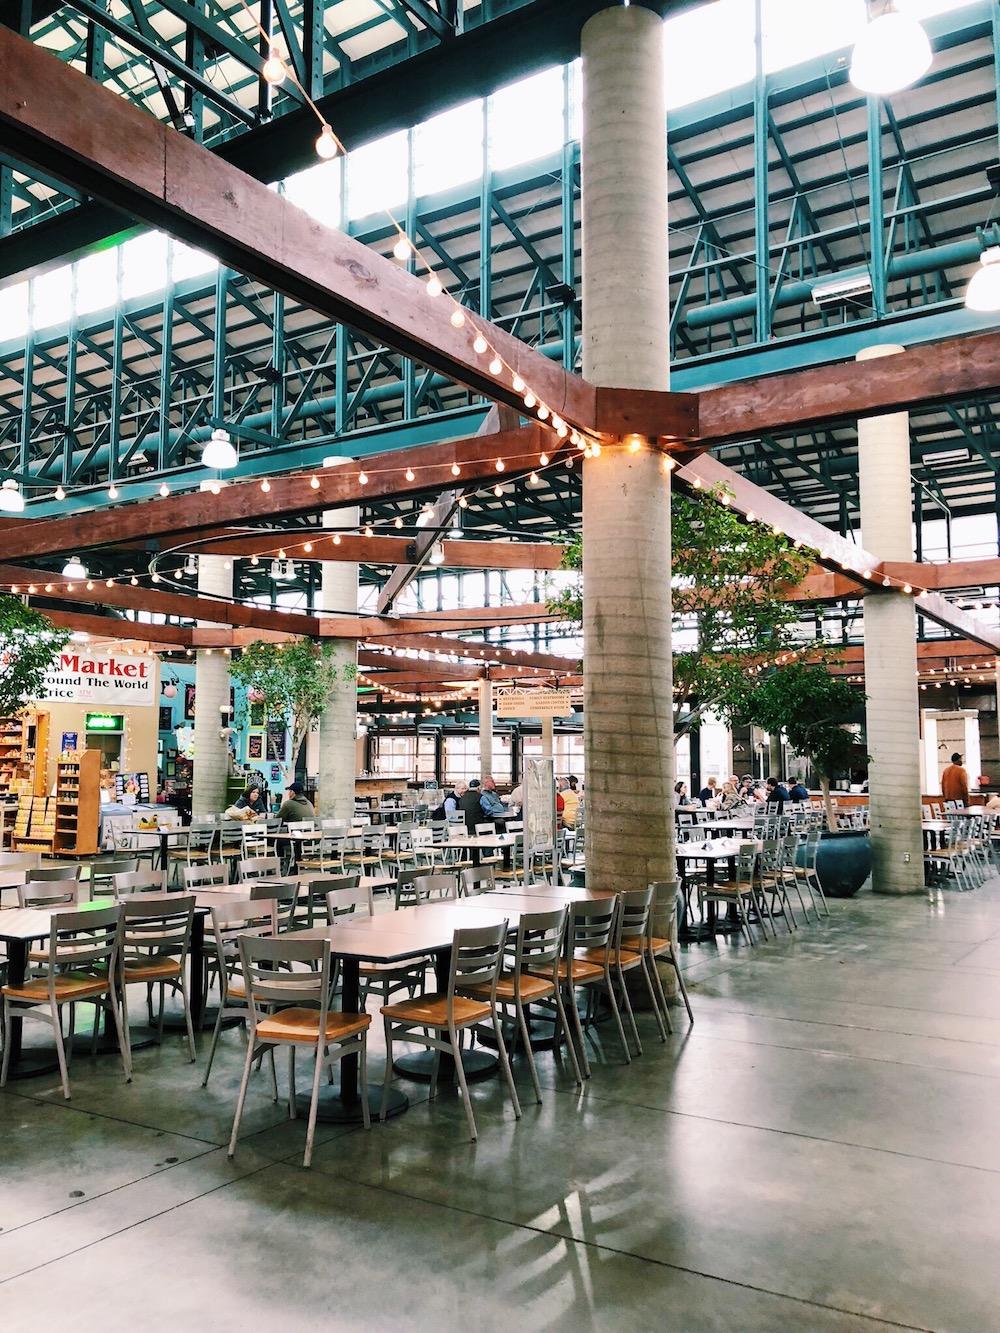 Wood panels and shops restaurants